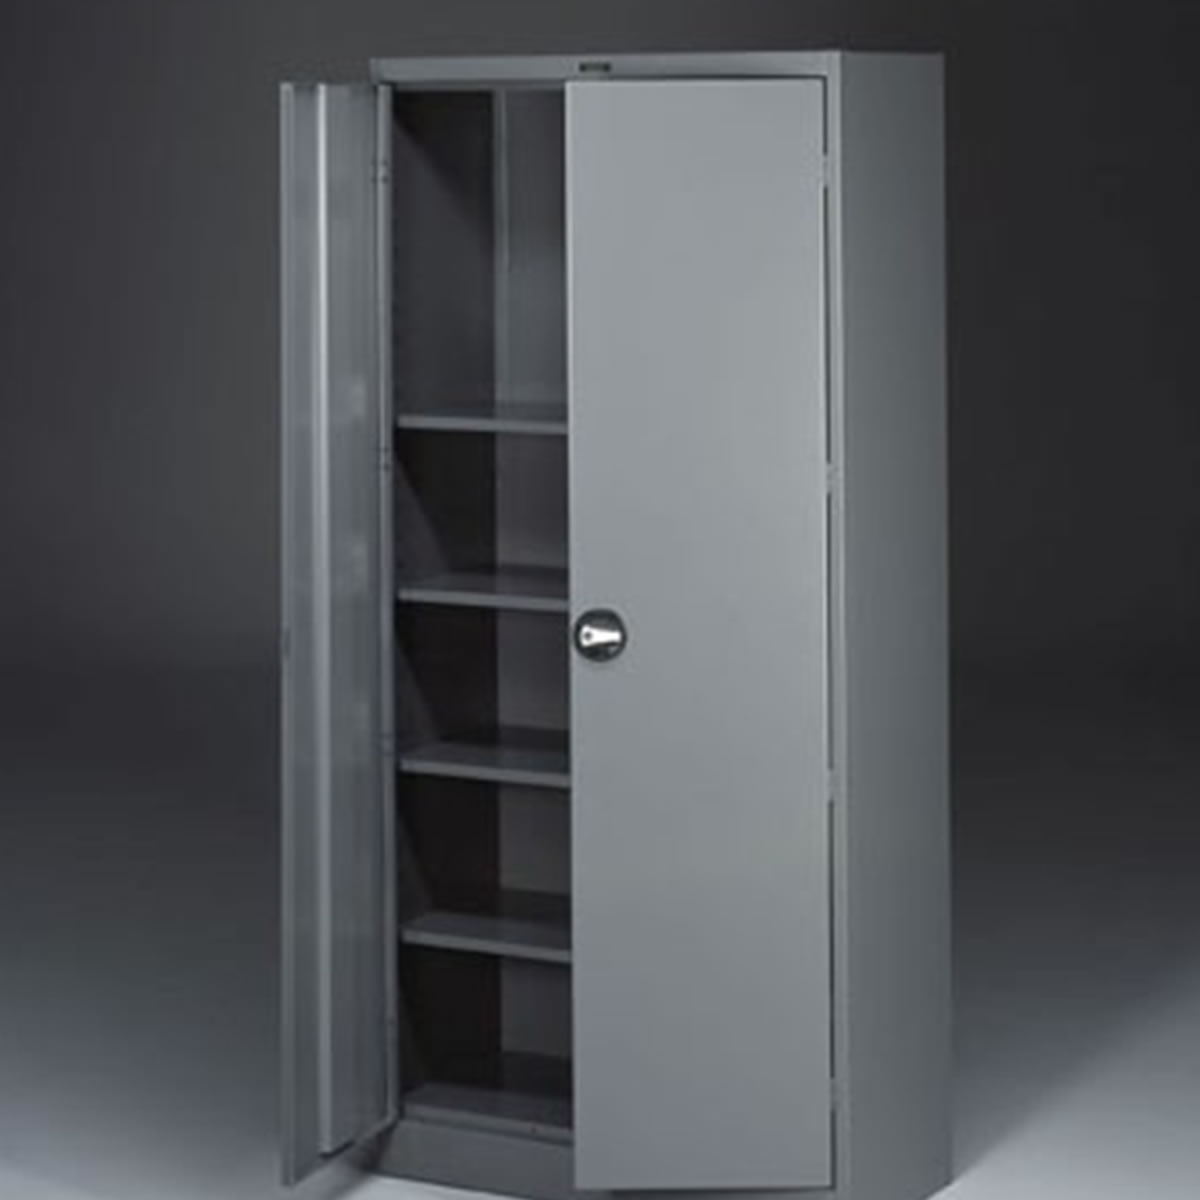 Business Amp Office Storage Vital Valt